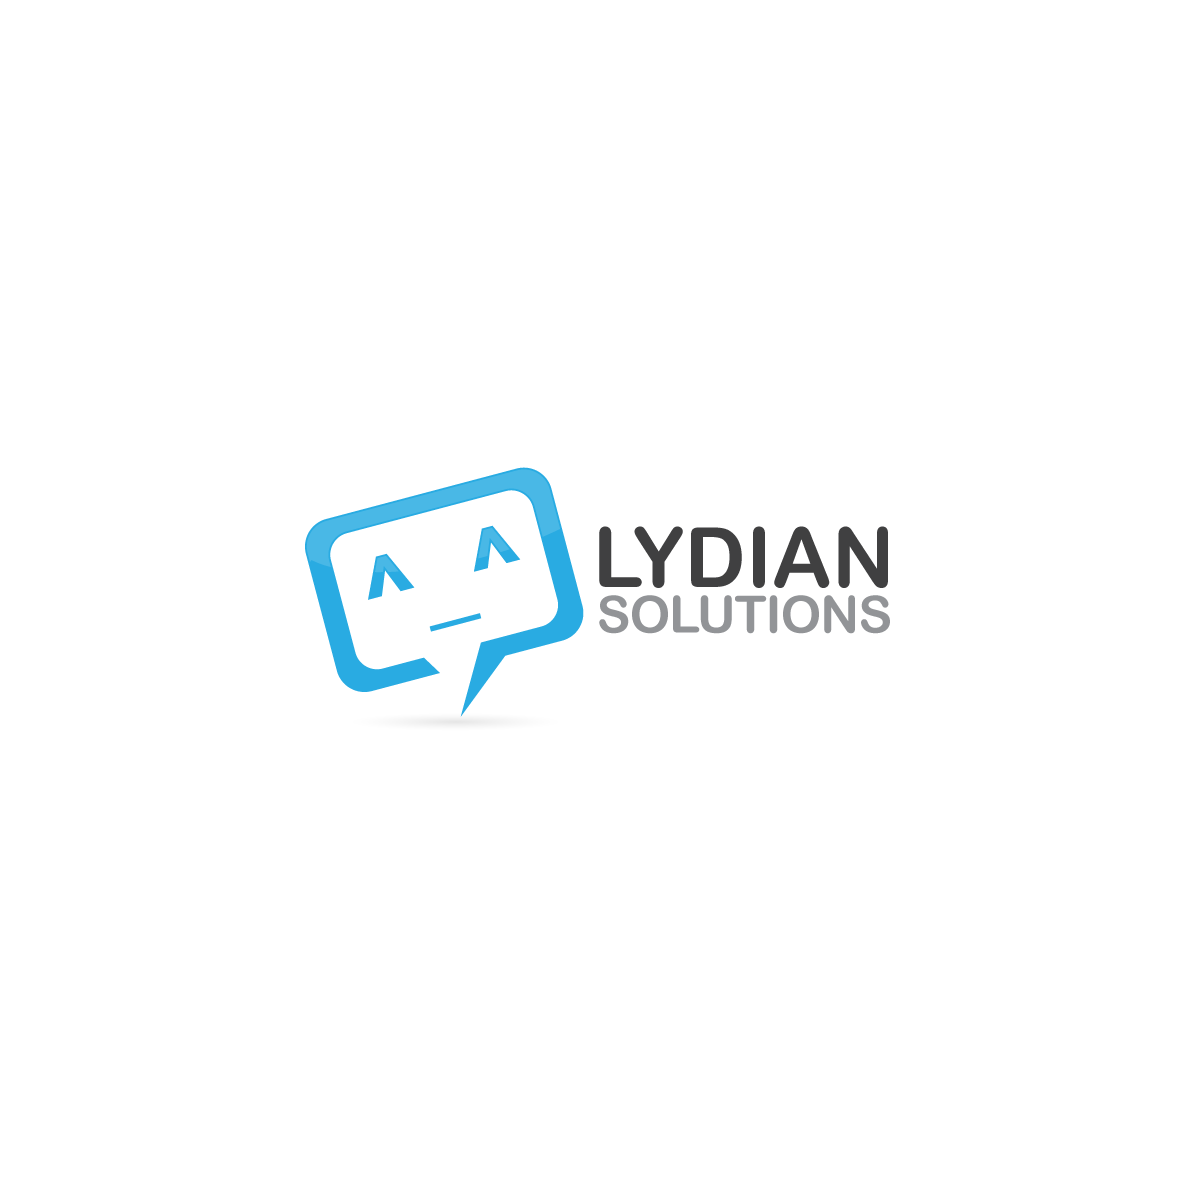 Logo Design by zesthar - Entry No. 131 in the Logo Design Contest Fun Logo Design for Lydian Solutions.